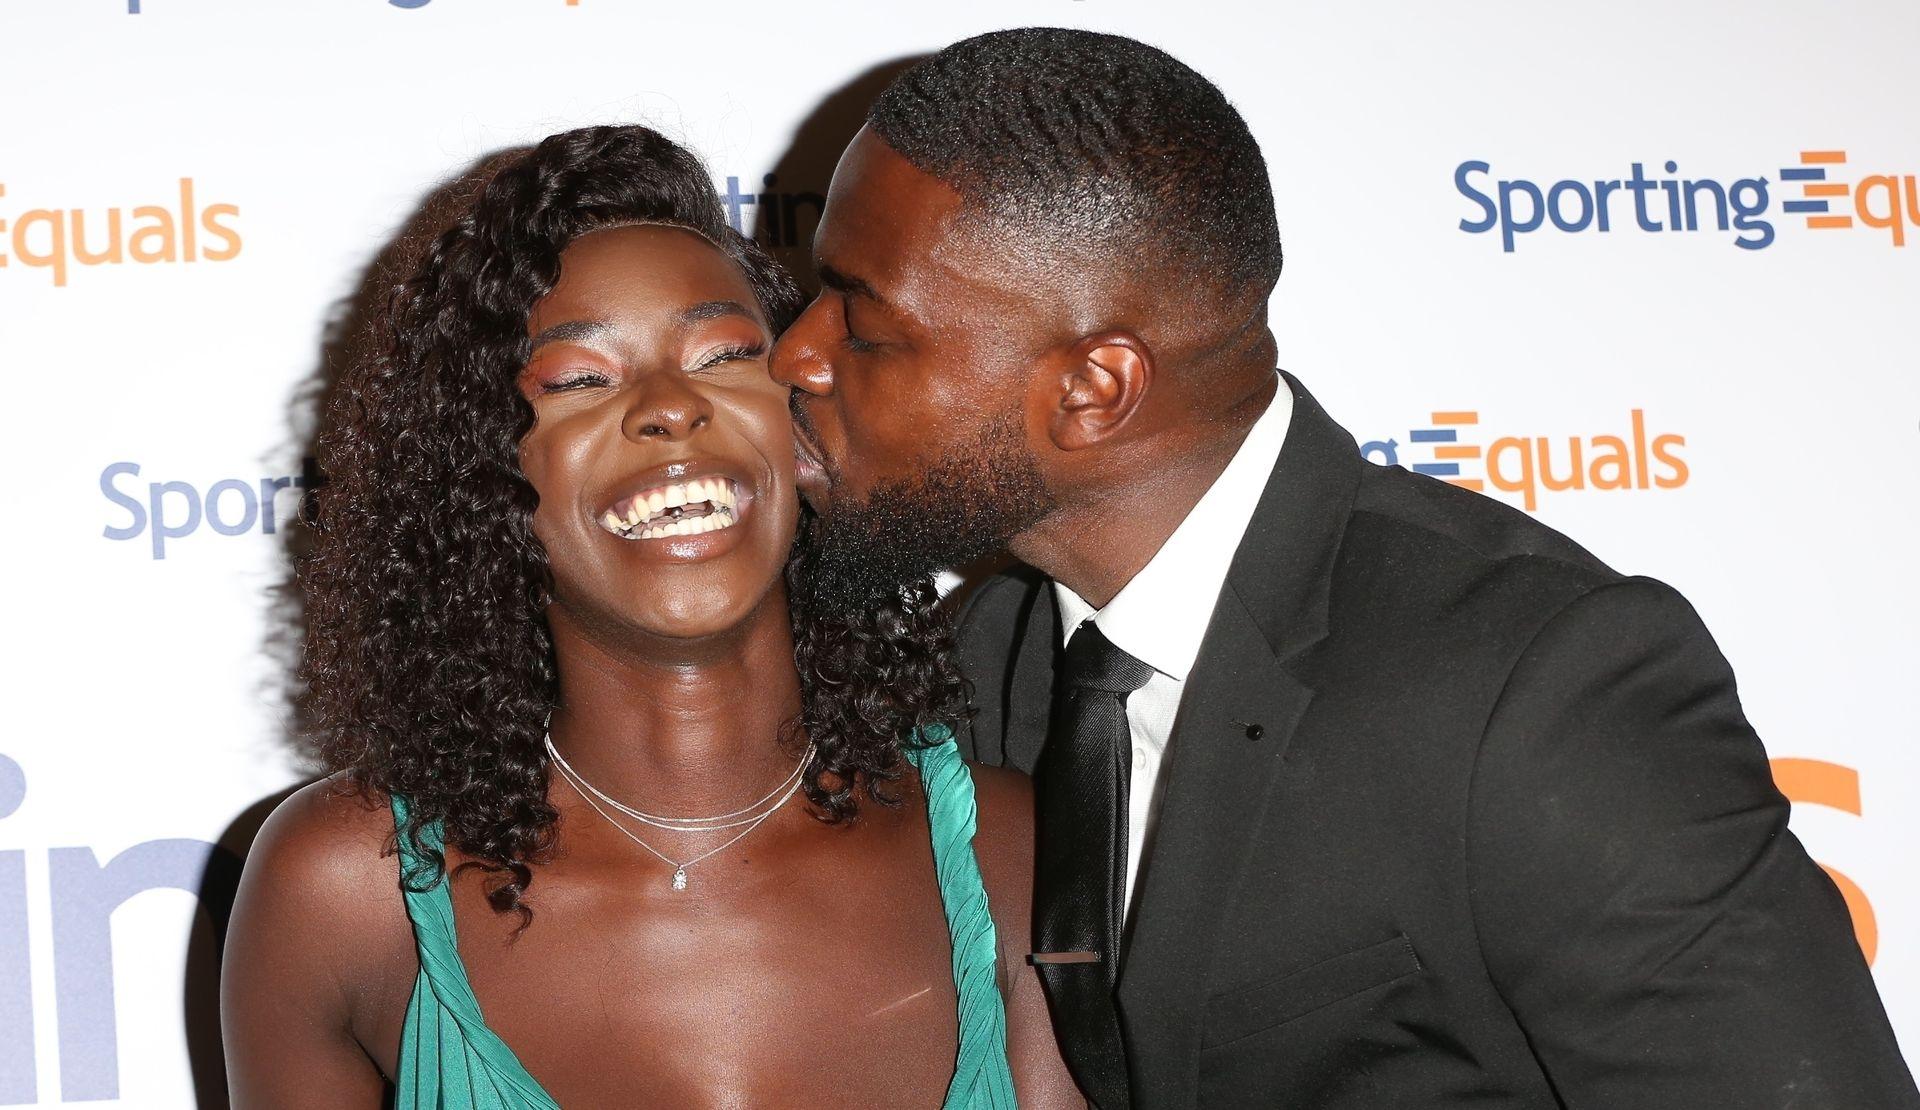 Mike Boateng & Priscilla Anyabu Are Seen At British Ethnic Diversity Sports Awards 0100